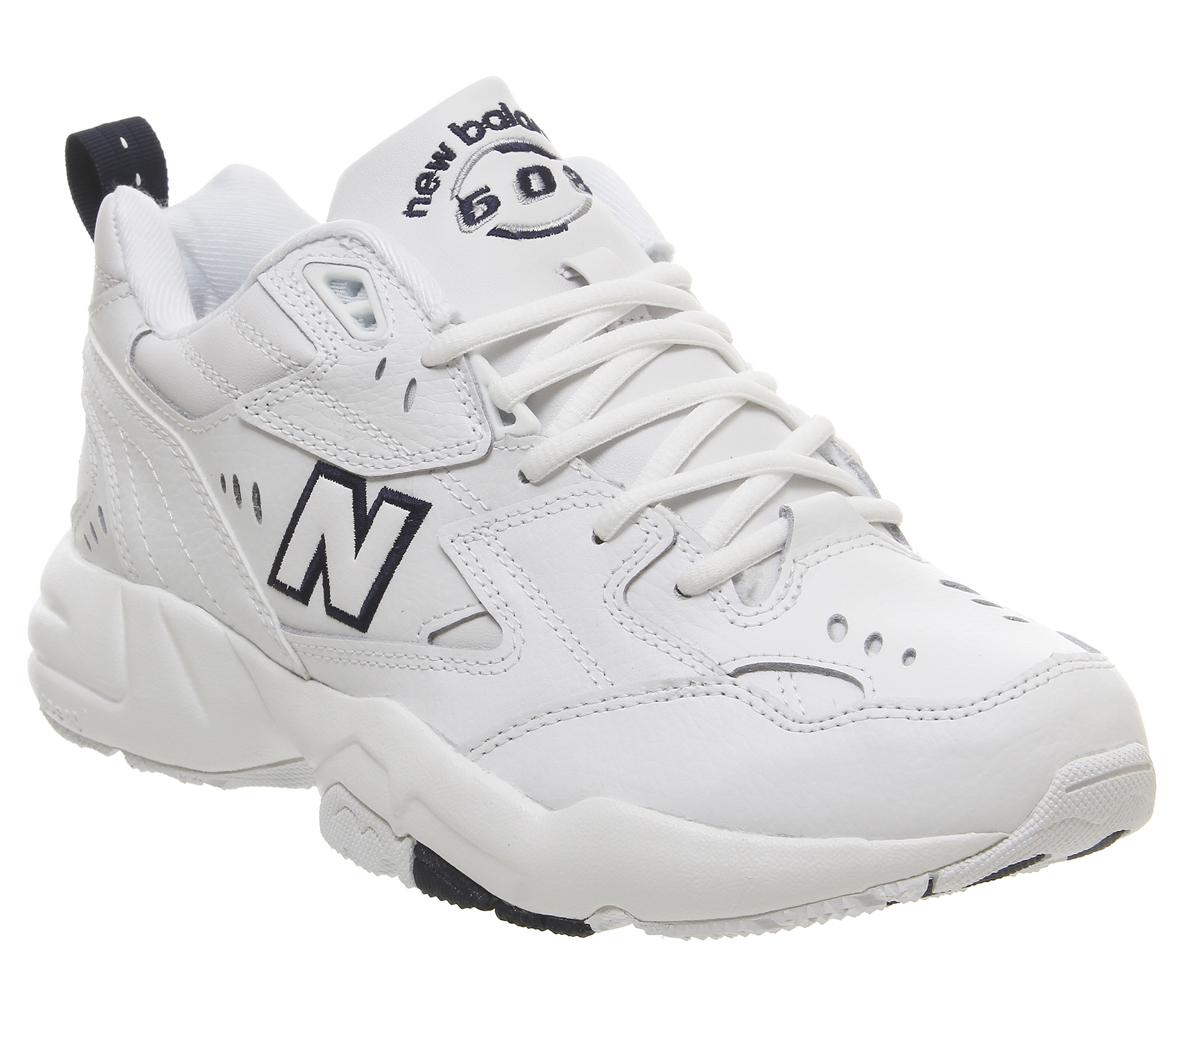 New Balance Chunky Sneaker Outlet Deutschland New Balance